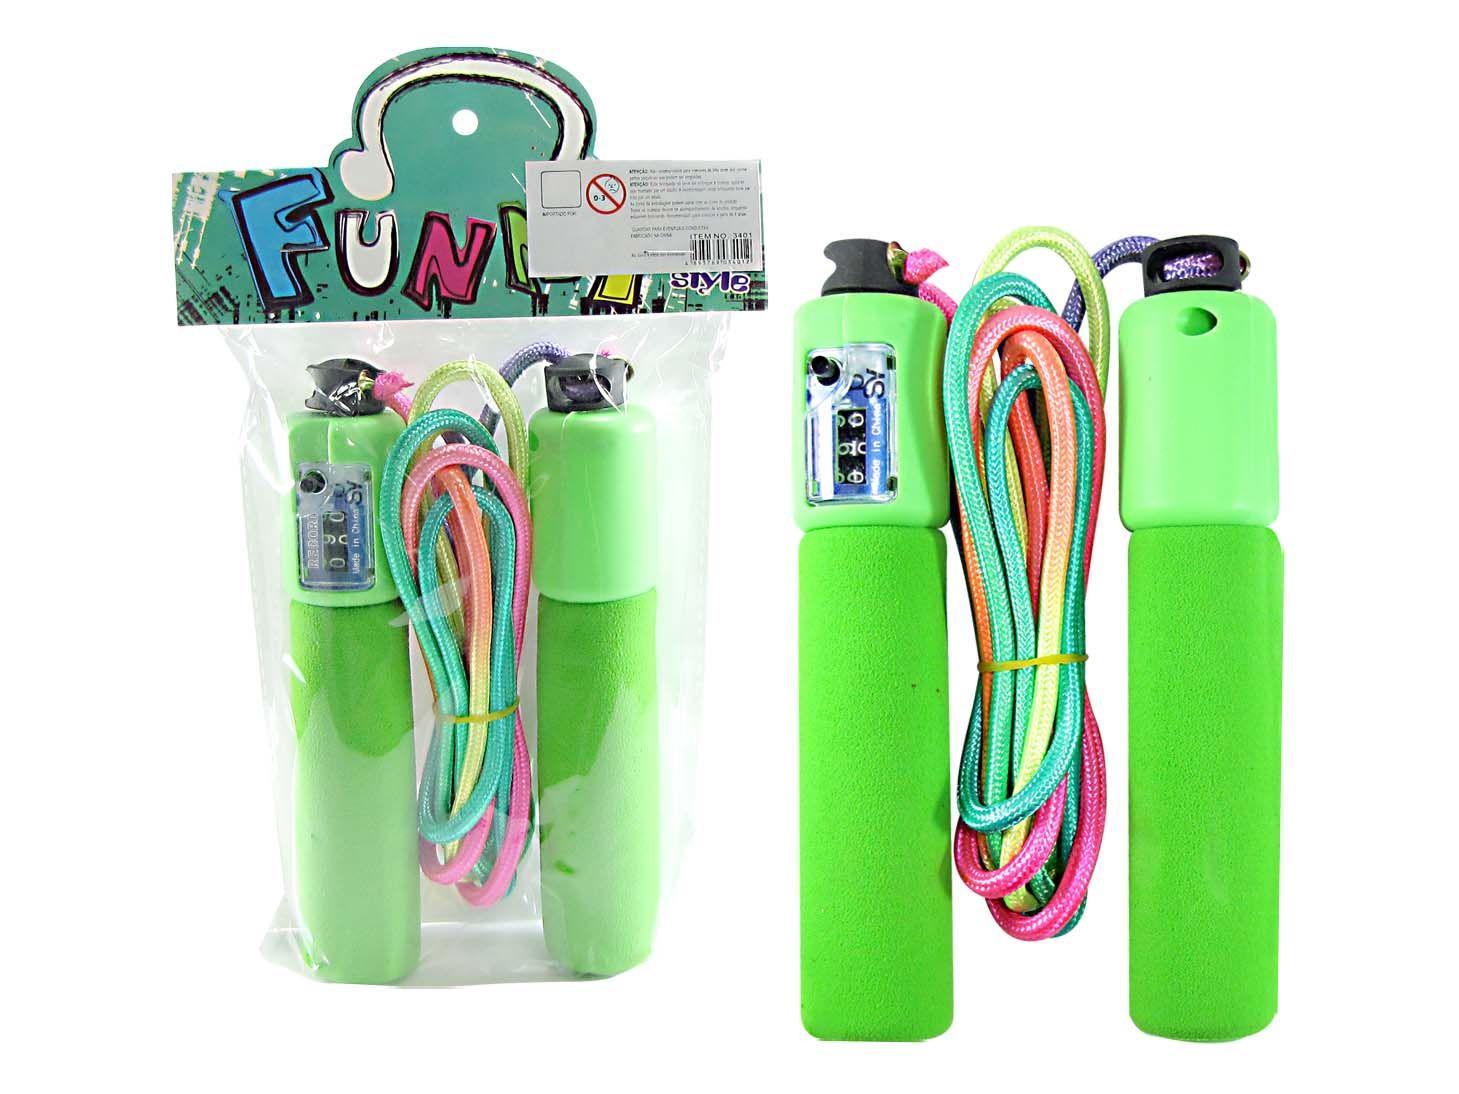 Kit 10 Pula Corda Infantil Colorido Divertido Funny Verde - 3401